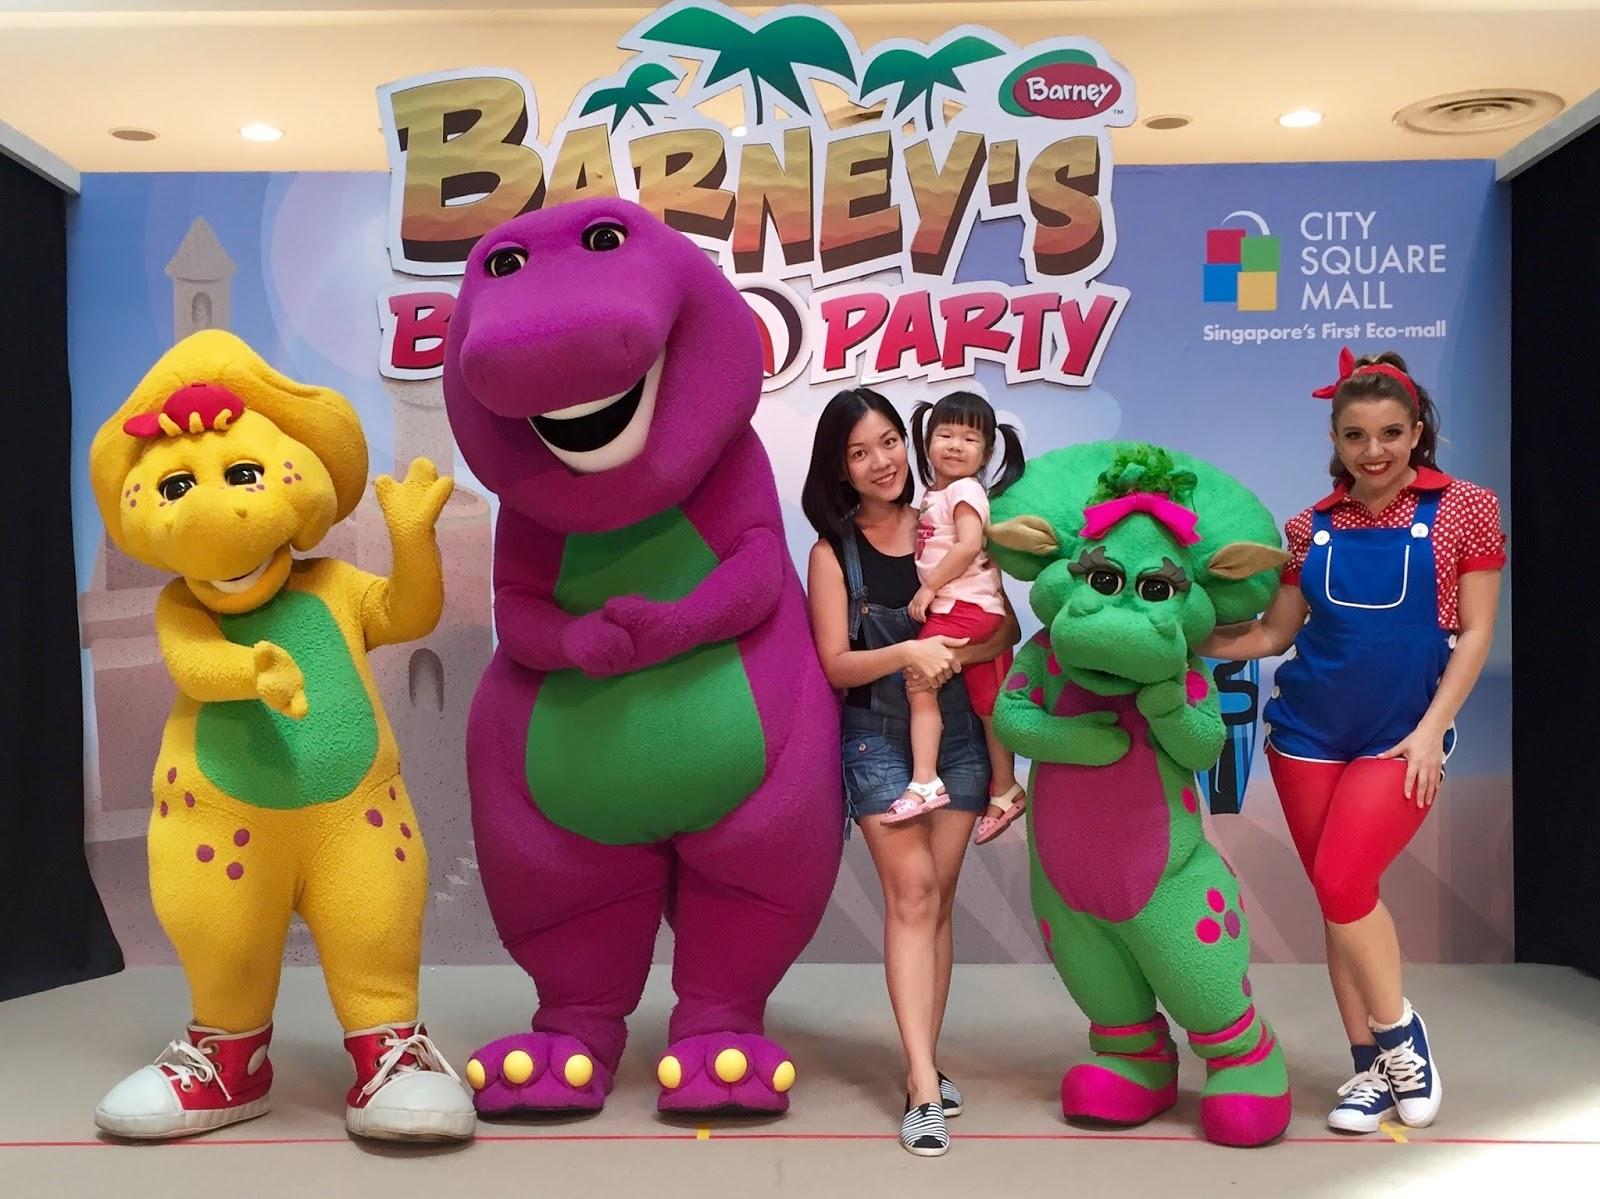 Ashlyn Thia: Barney's Beach Party 'Live' On Stage @ City